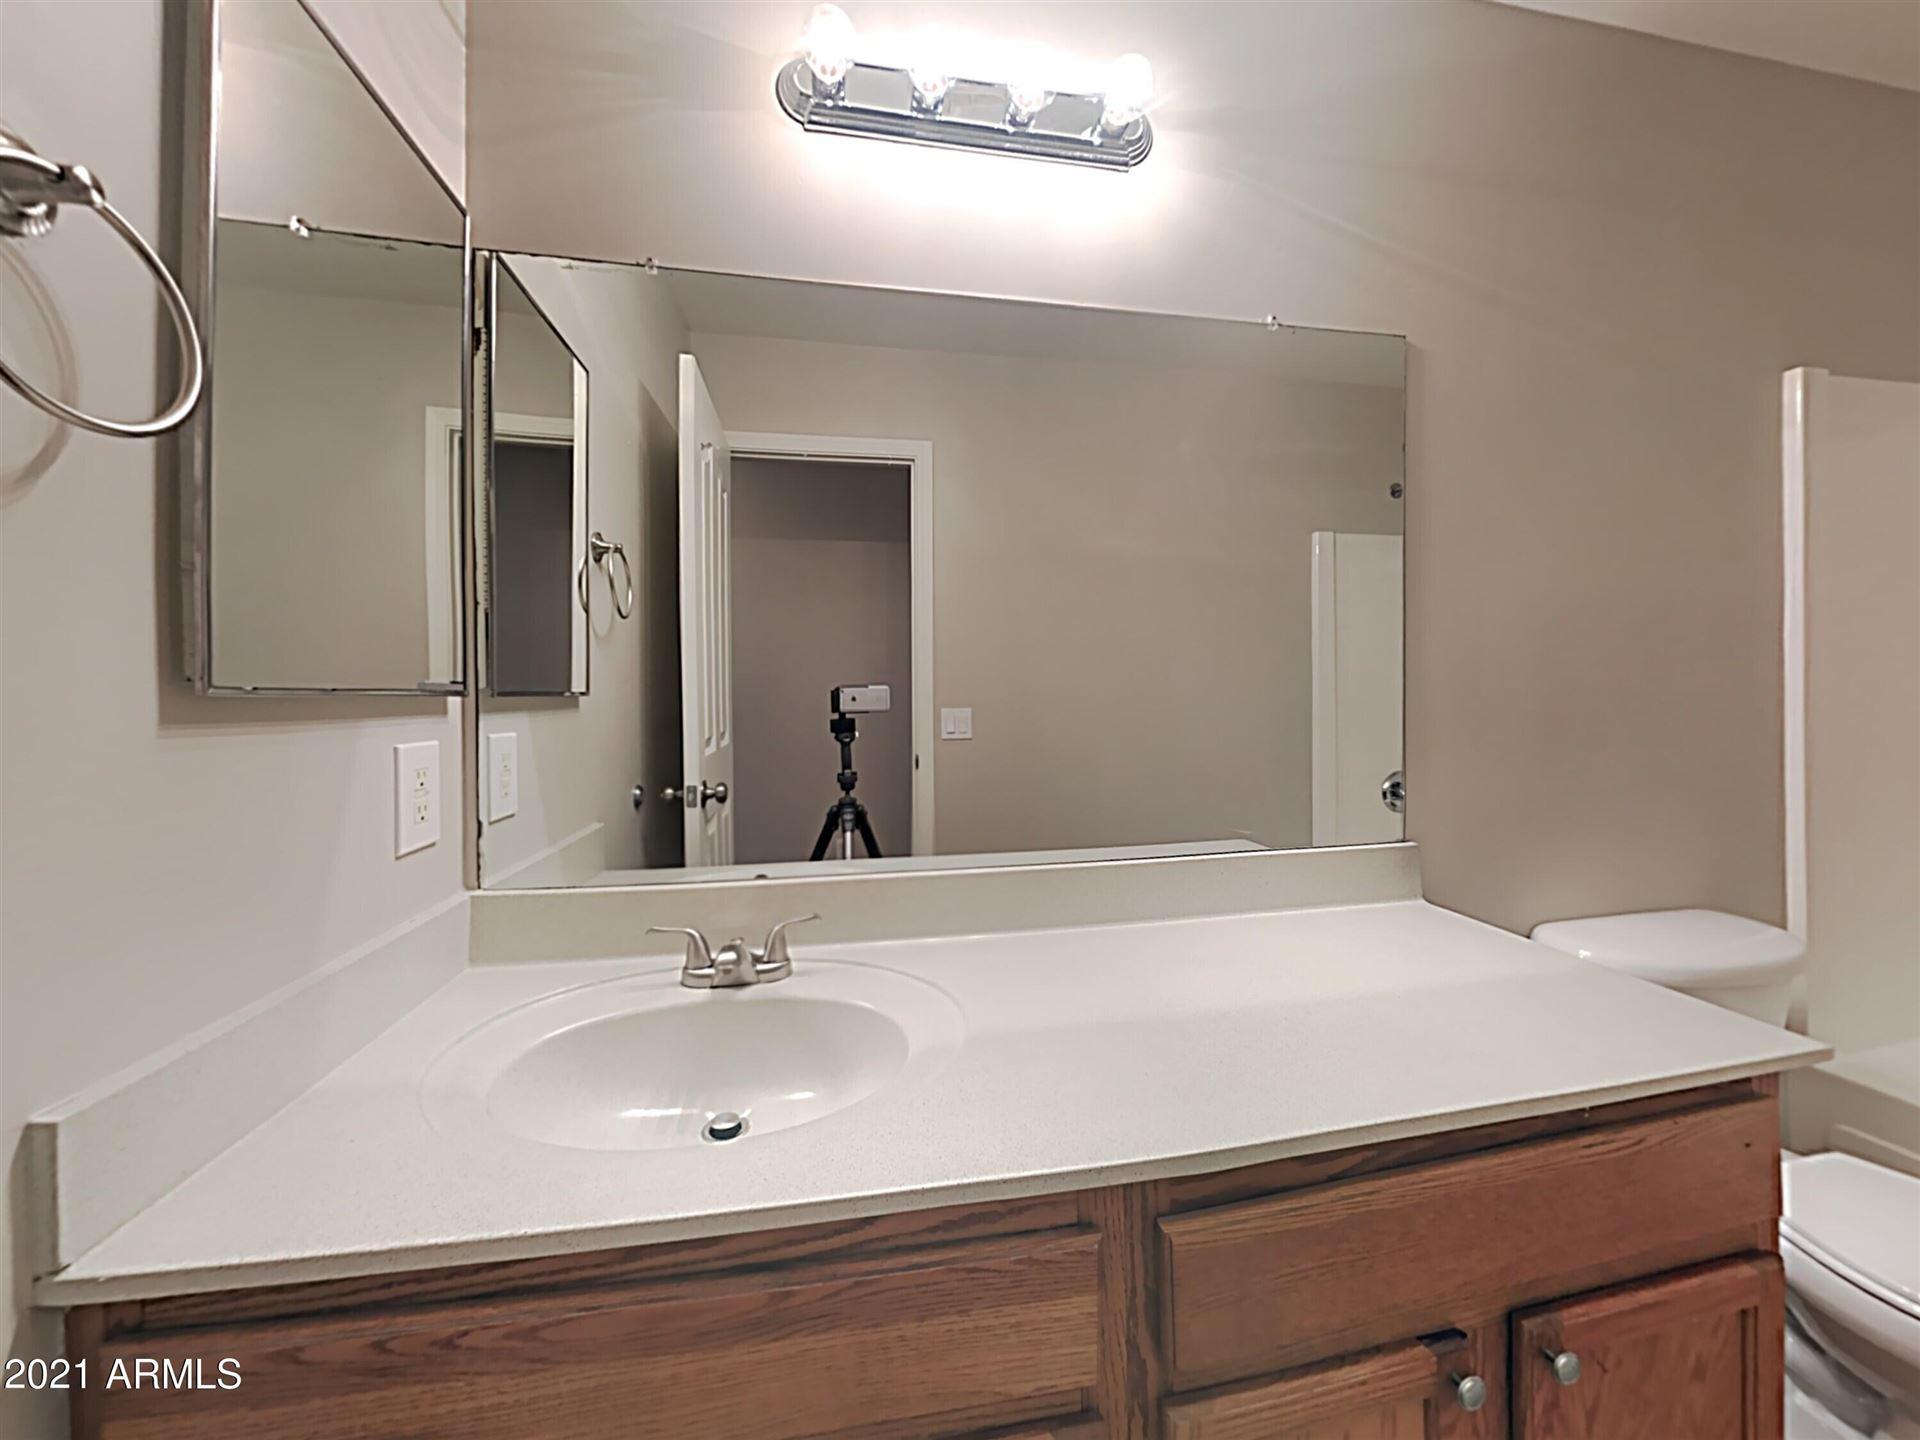 Photo of 11635 W CINNABAR Avenue, Youngtown, AZ 85363 (MLS # 6297535)